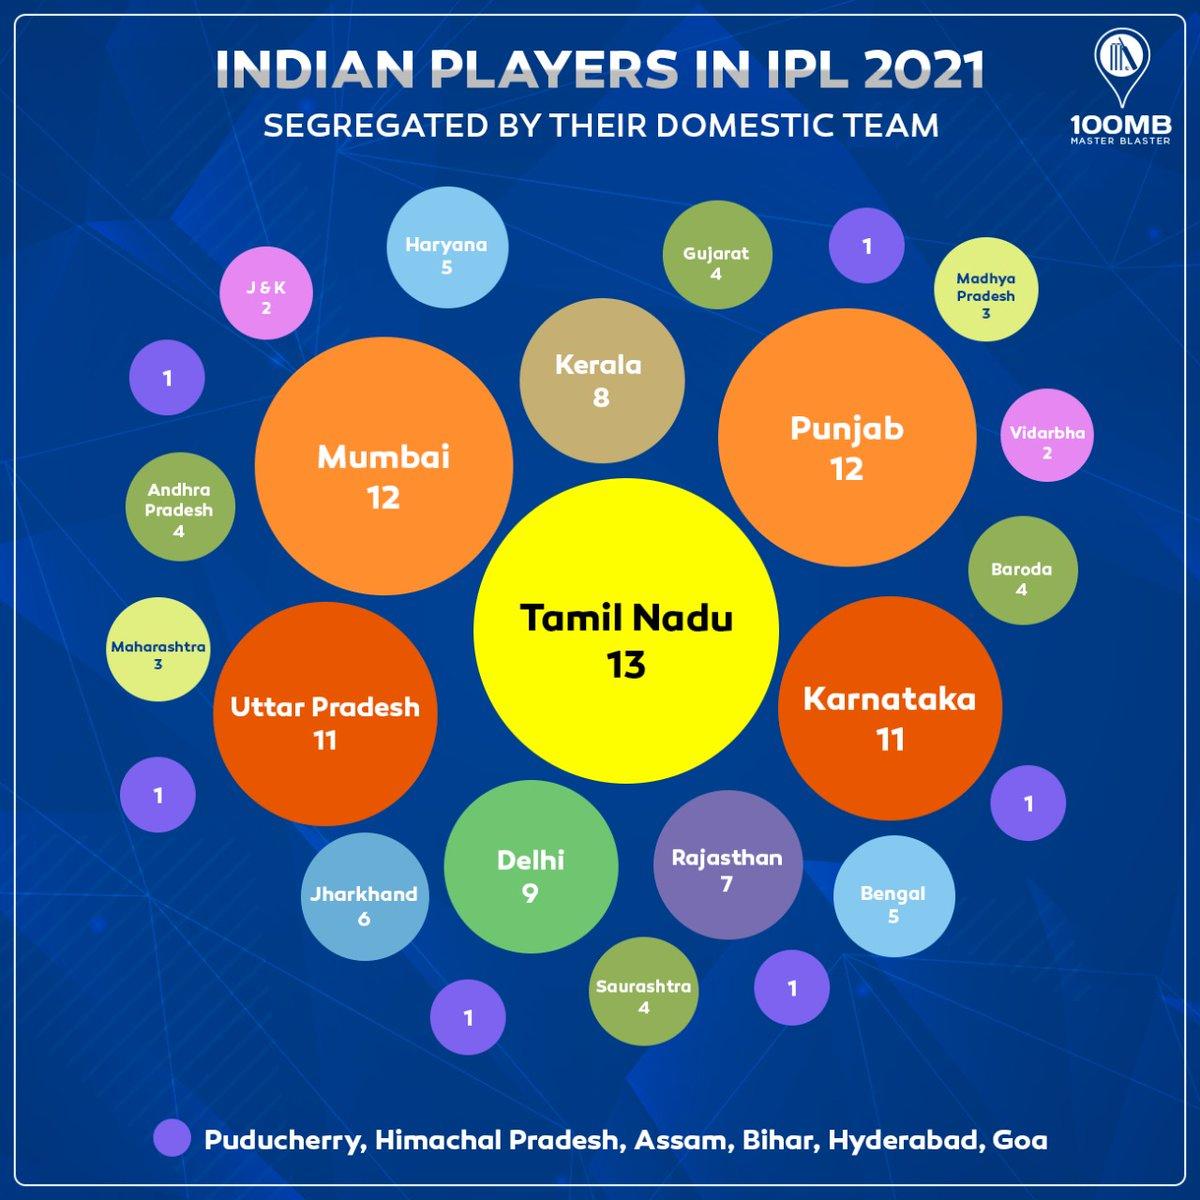 When it comes to contributing players to IPL, teams like Tamil Nadu, Mumbai, Punjab, Karnataka & Uttar Pradesh are at the forefront!  #IPL2021